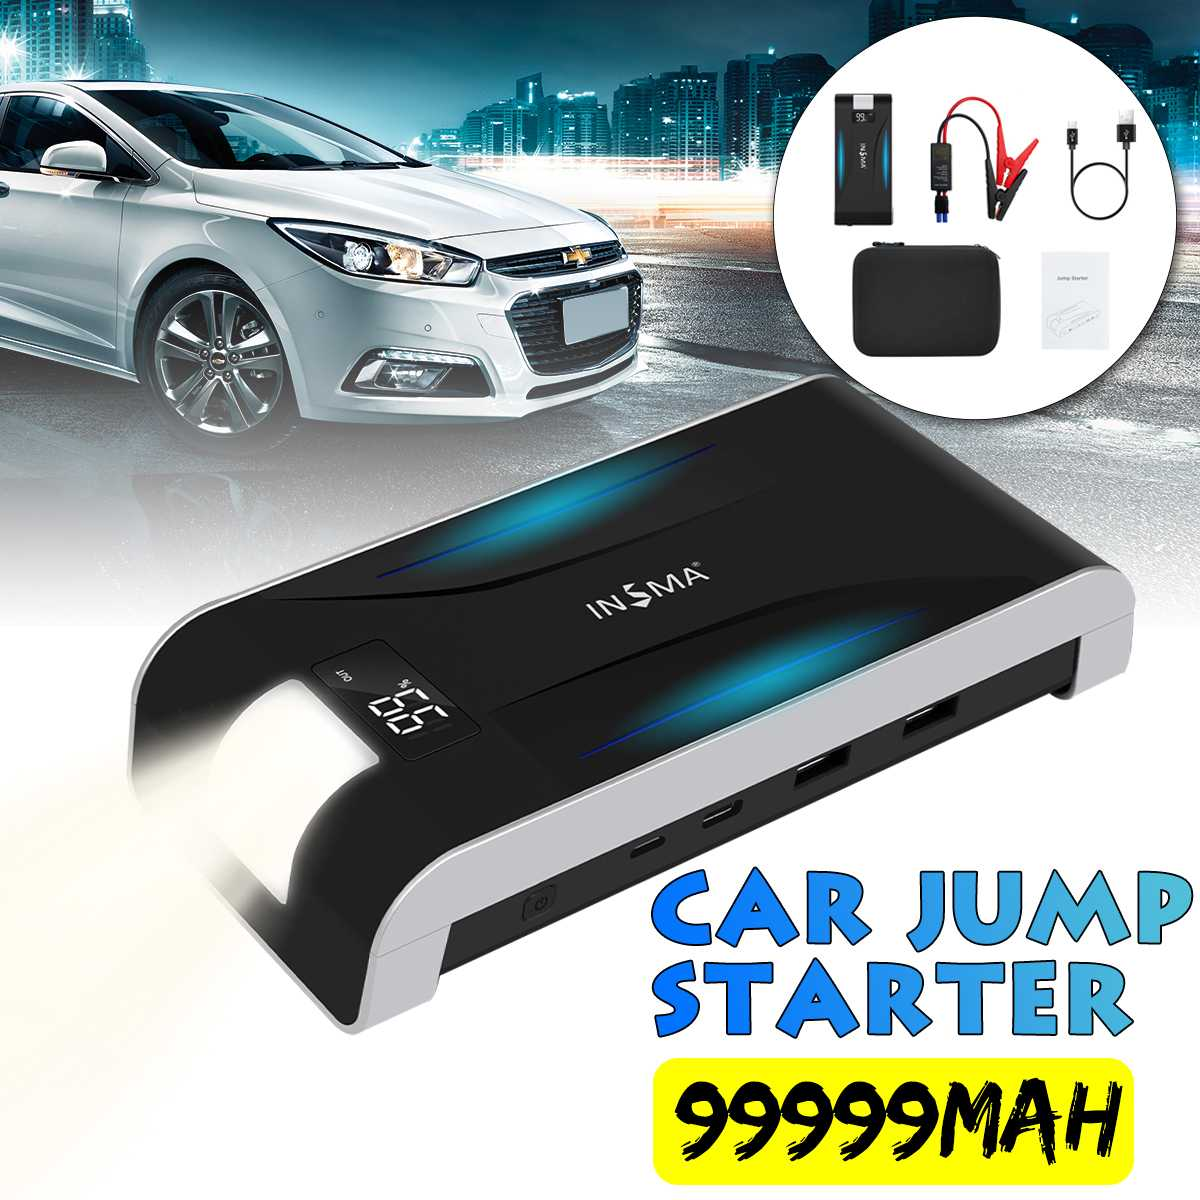 INSMA 99999mAh 4Ports Car Jump Starter Cars Battery Jumper 12V 3.0 Fast Charger USB Type-C Emergency Power Bank SOS LED Flashlig